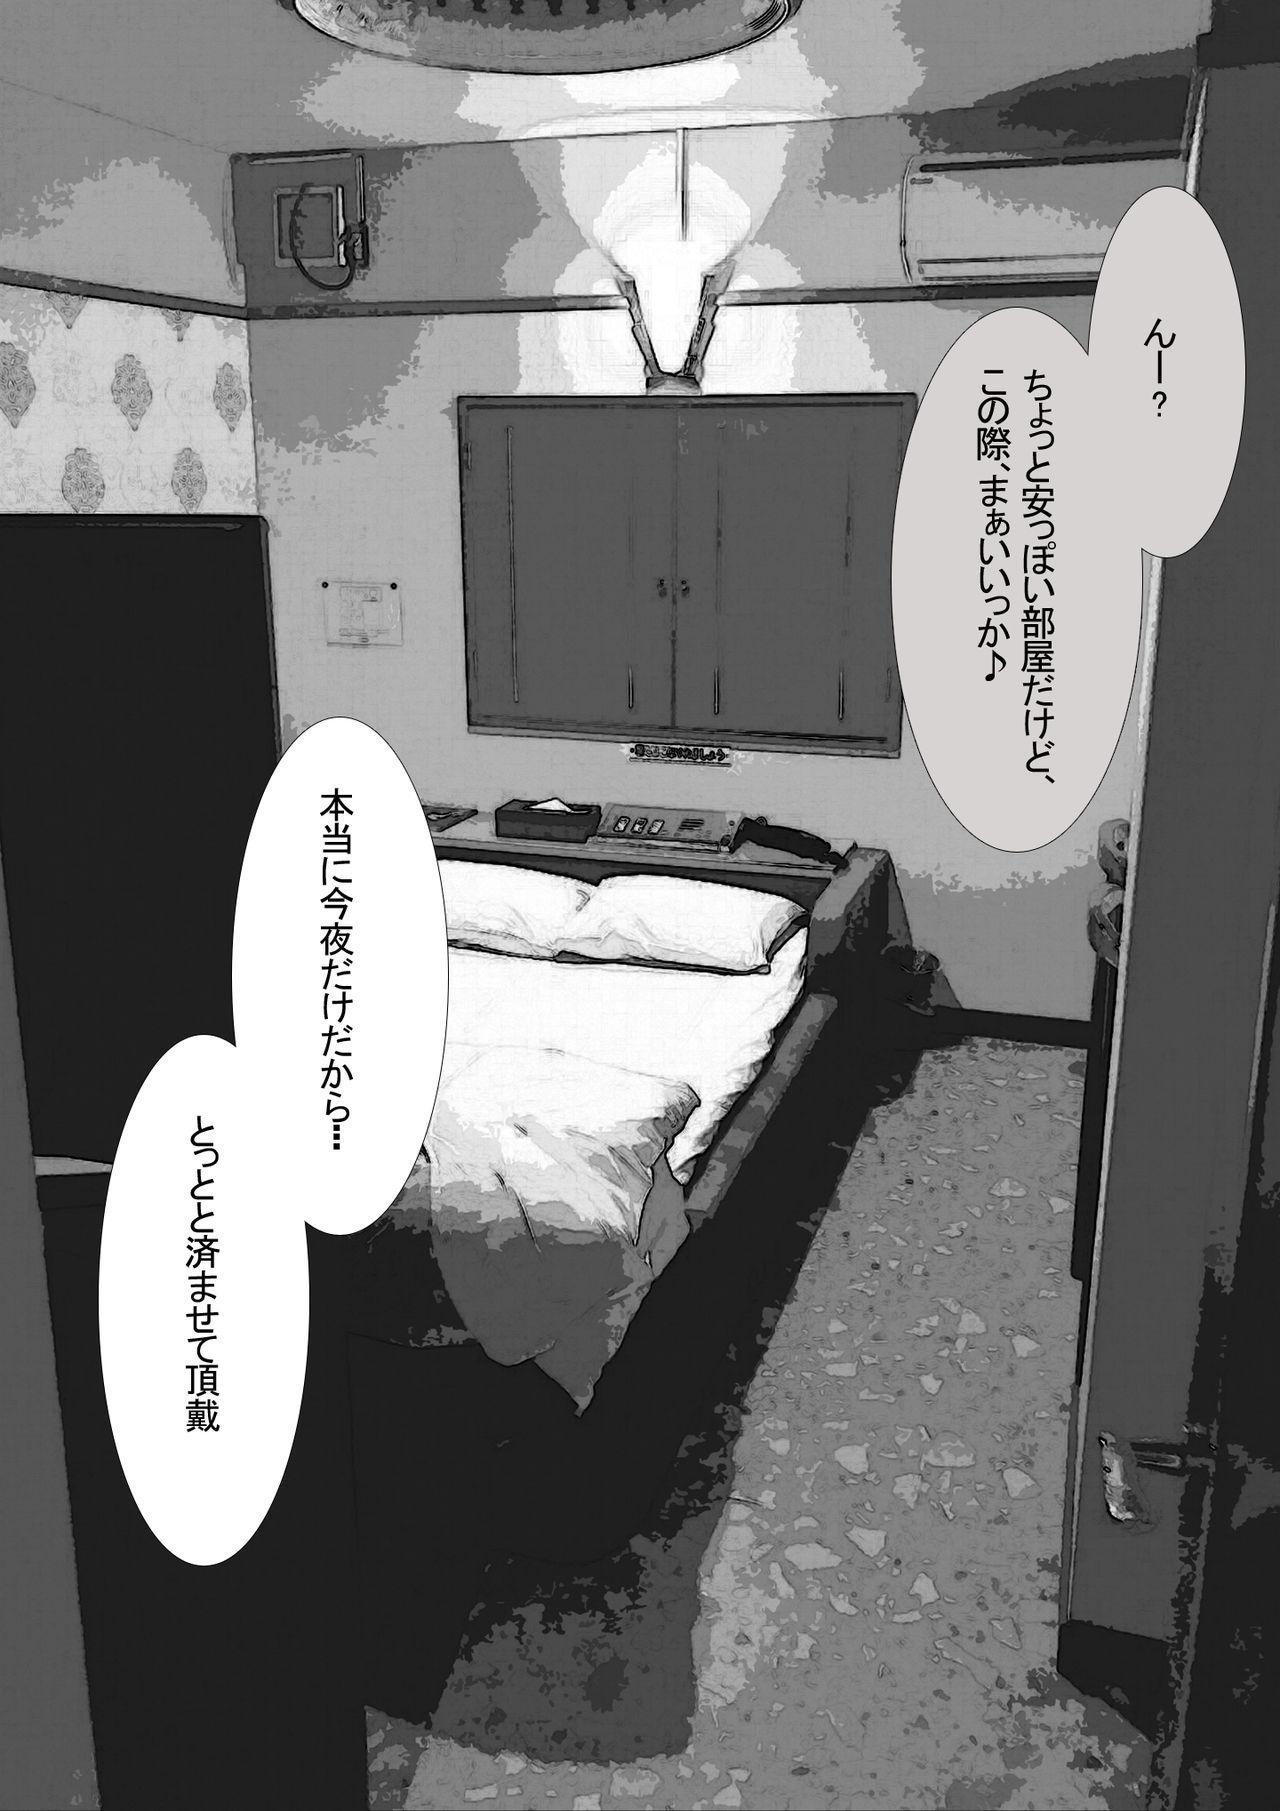 市ノ瀬美加子の場合 23